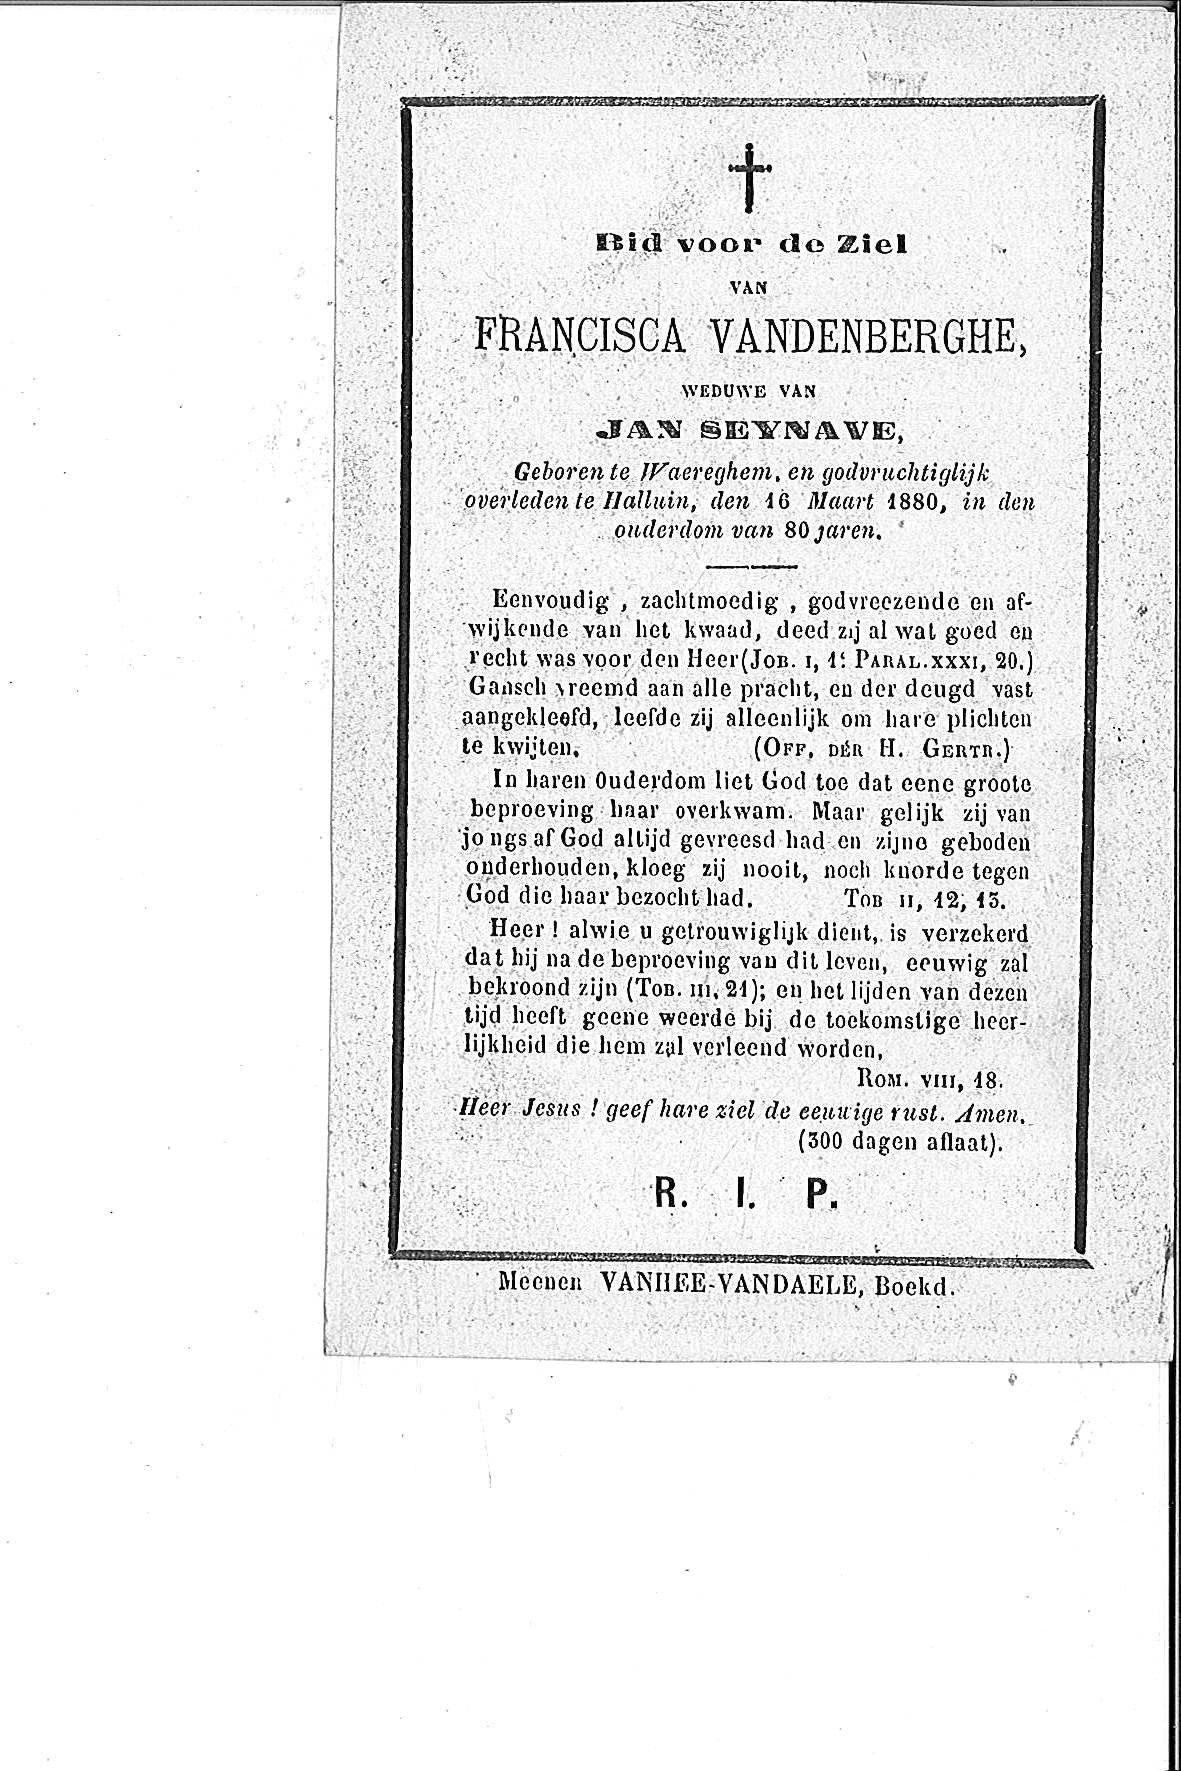 Francisca(1877)20150803081045_00130.jpg